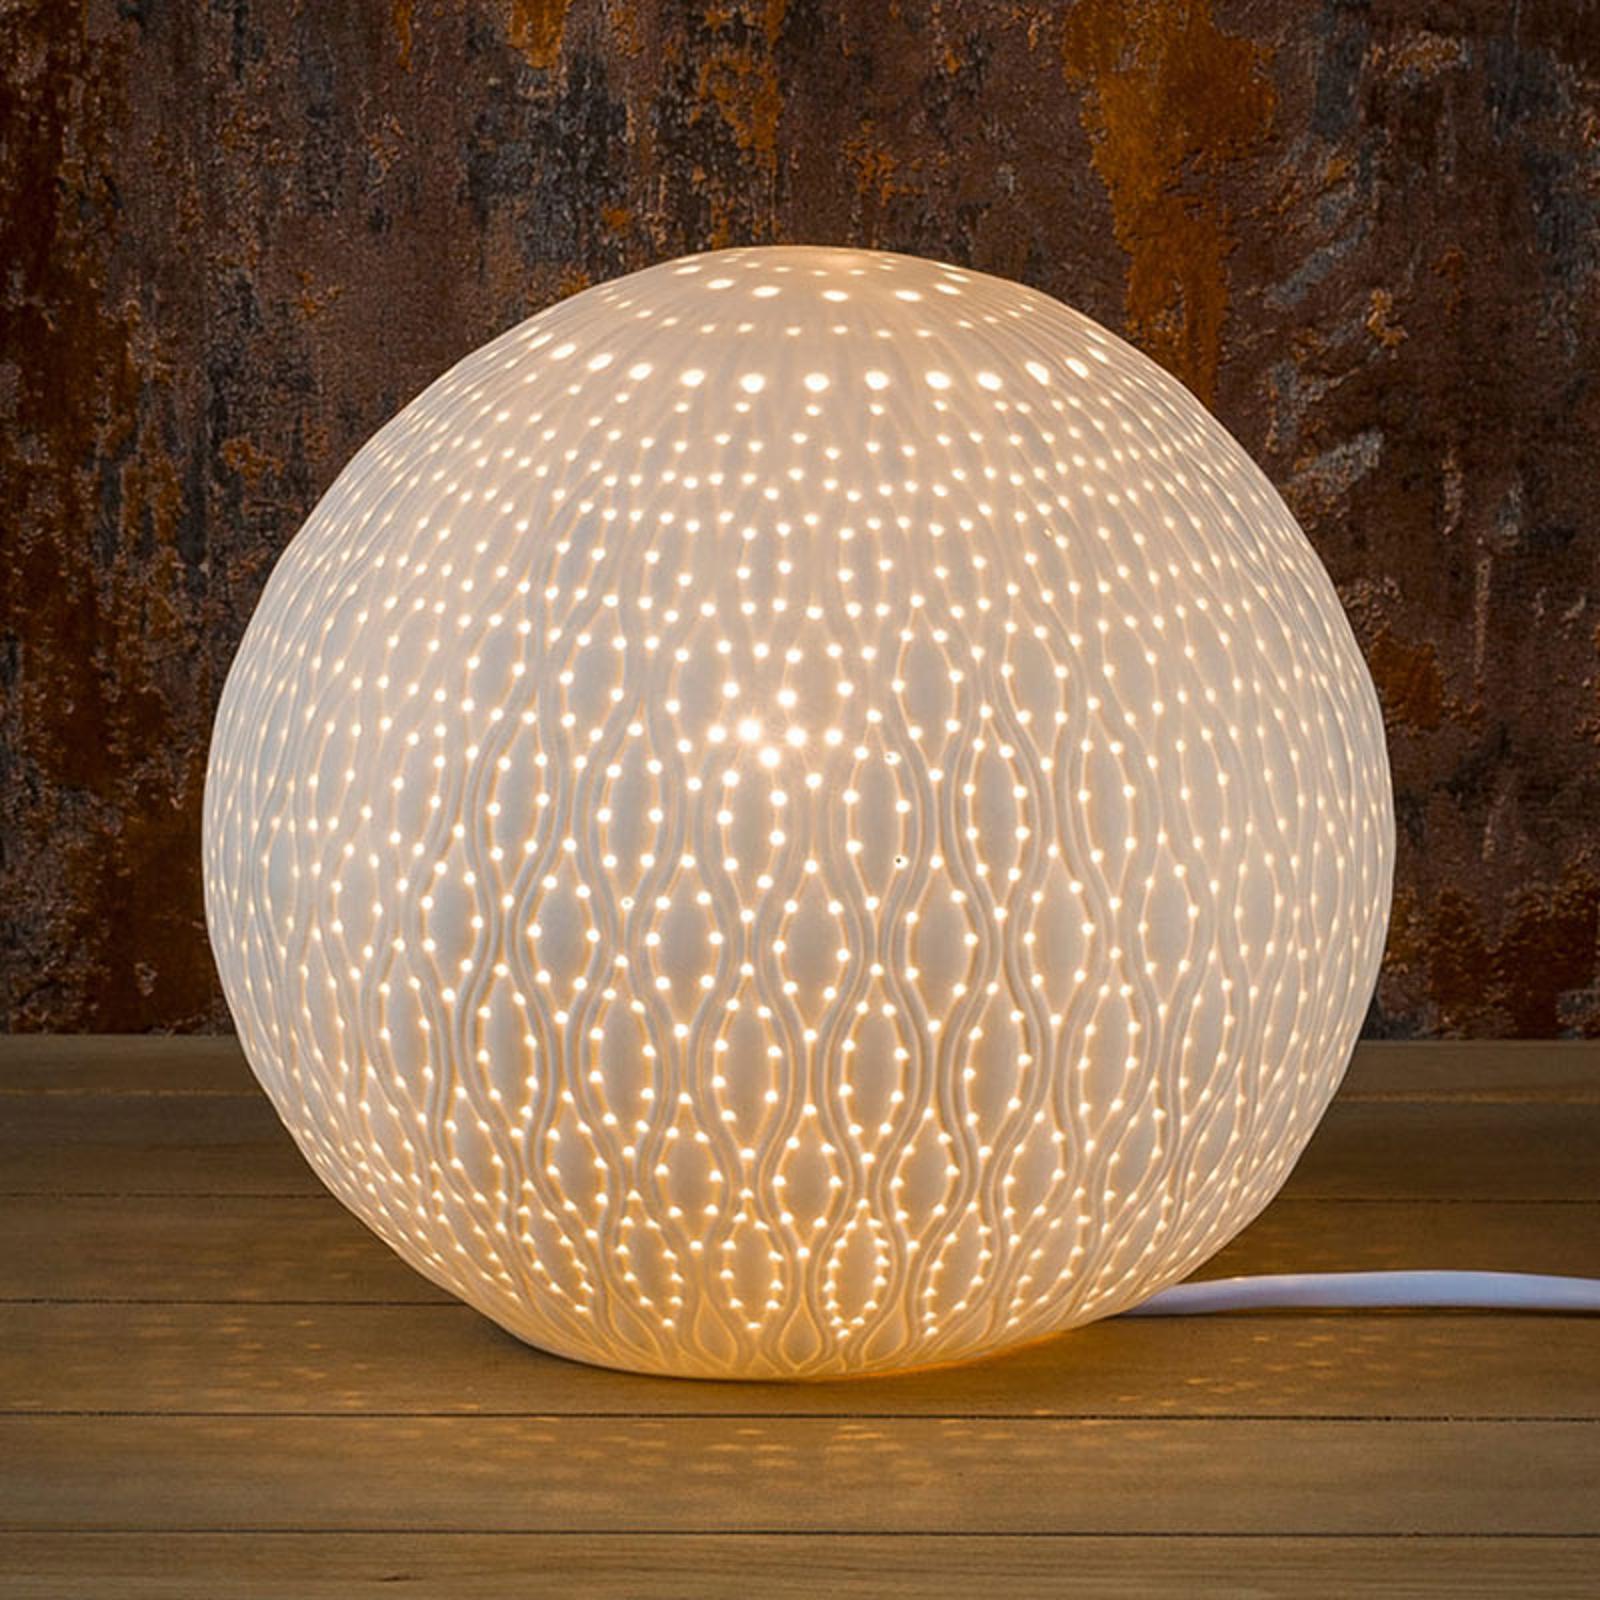 Saico Dekoračná lampa Orient z porcelánu